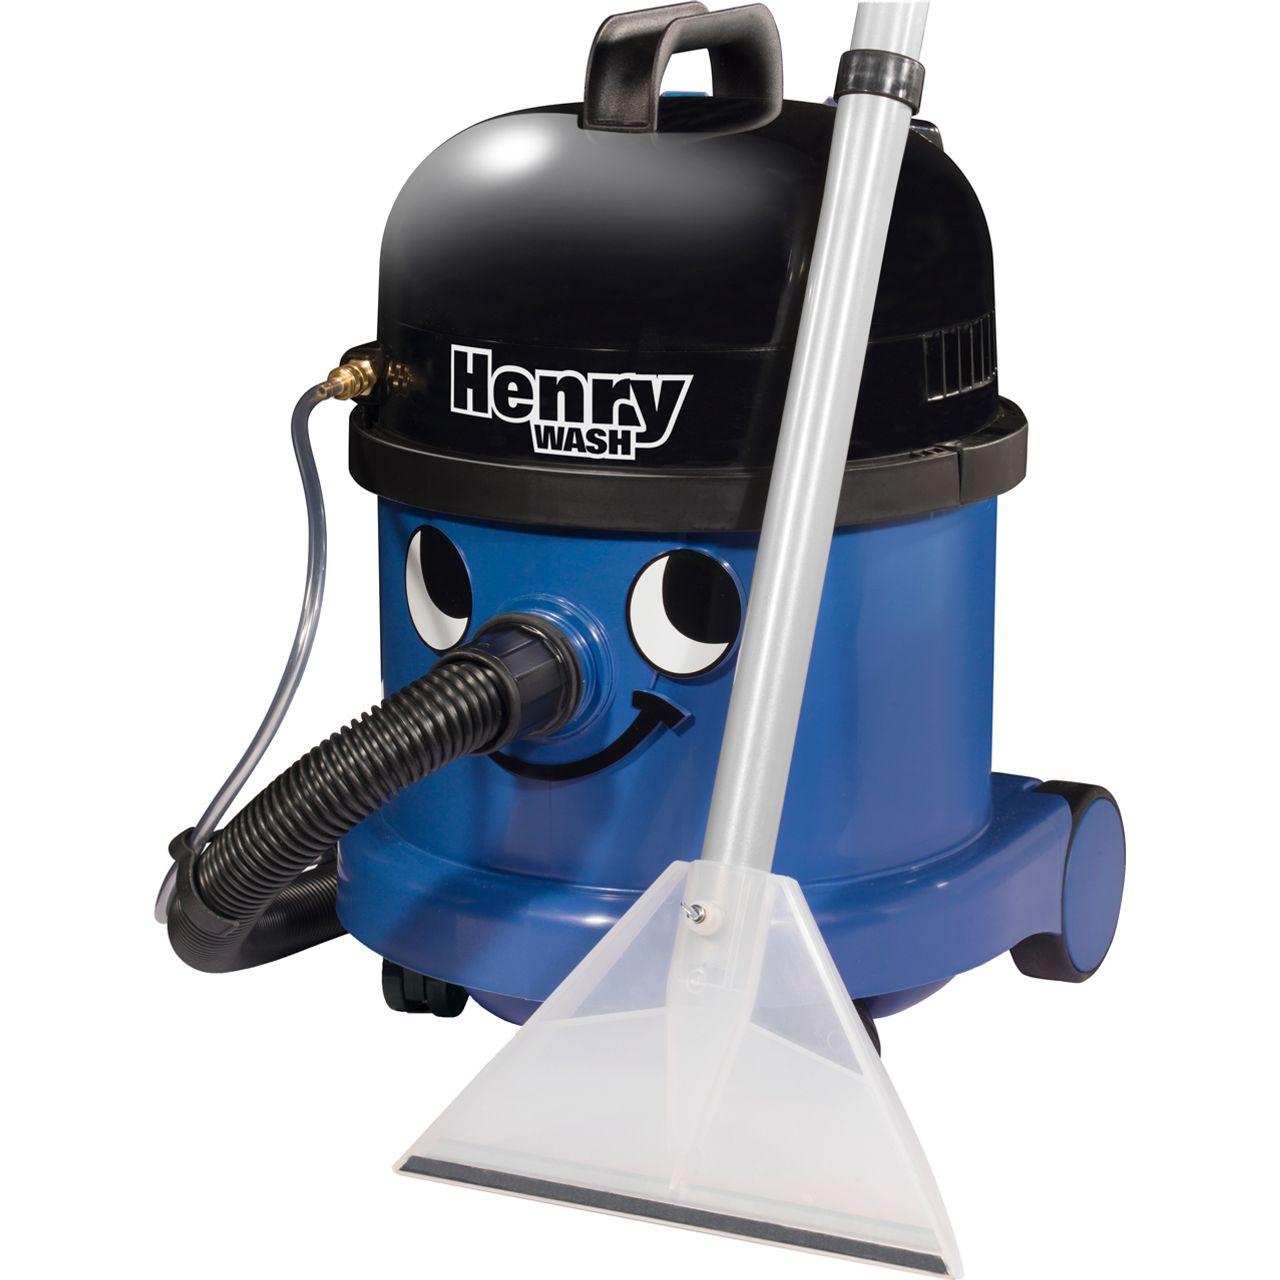 Numatic Carpet Cleaner Repairs